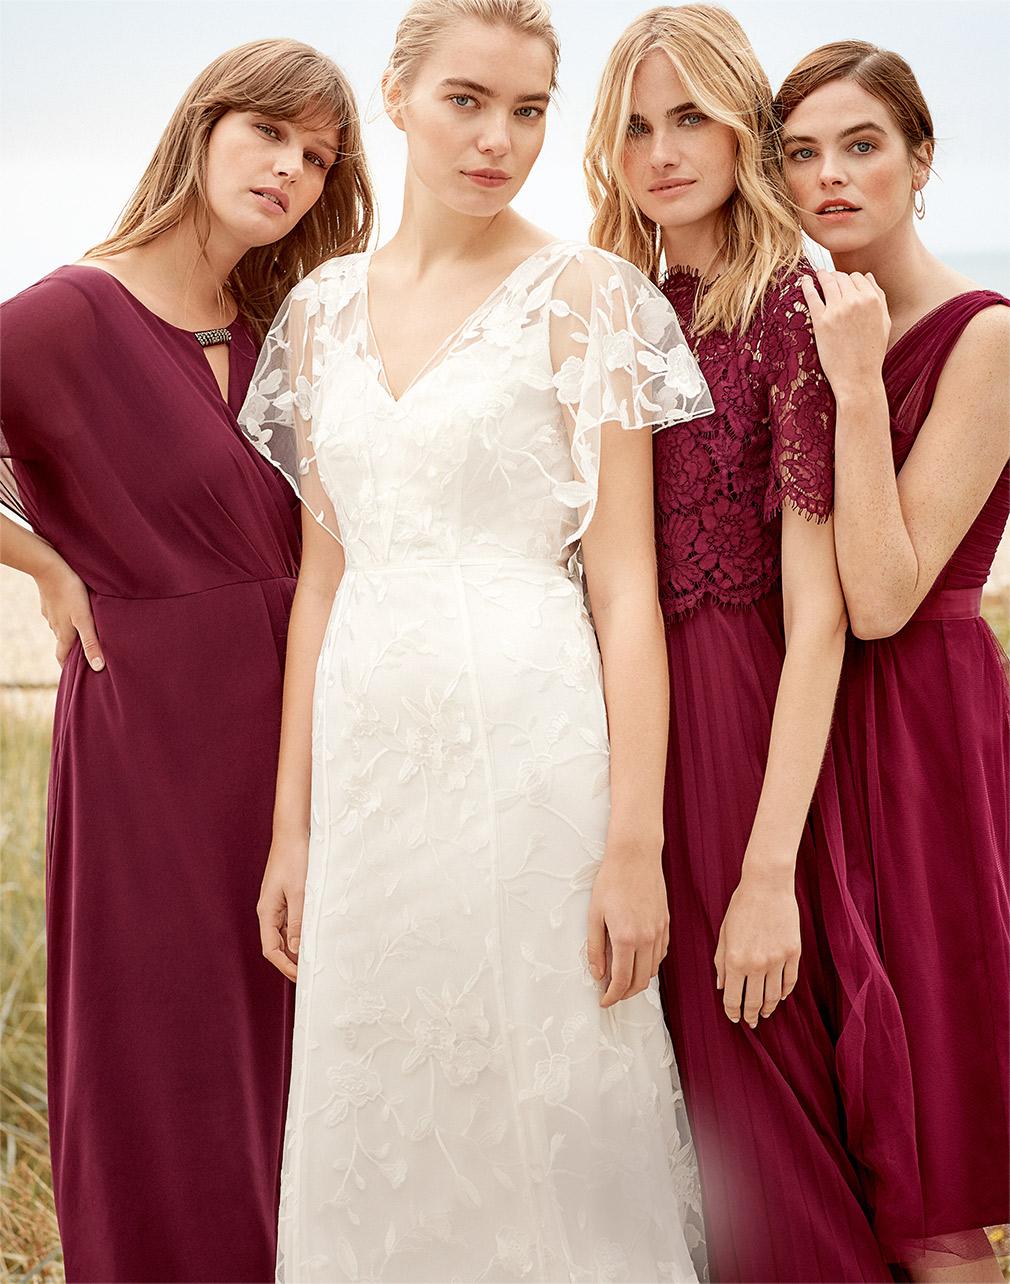 Layla Bridal Dress £450 | Elisabetta Dress £160 | Romy Tulle Dress £70